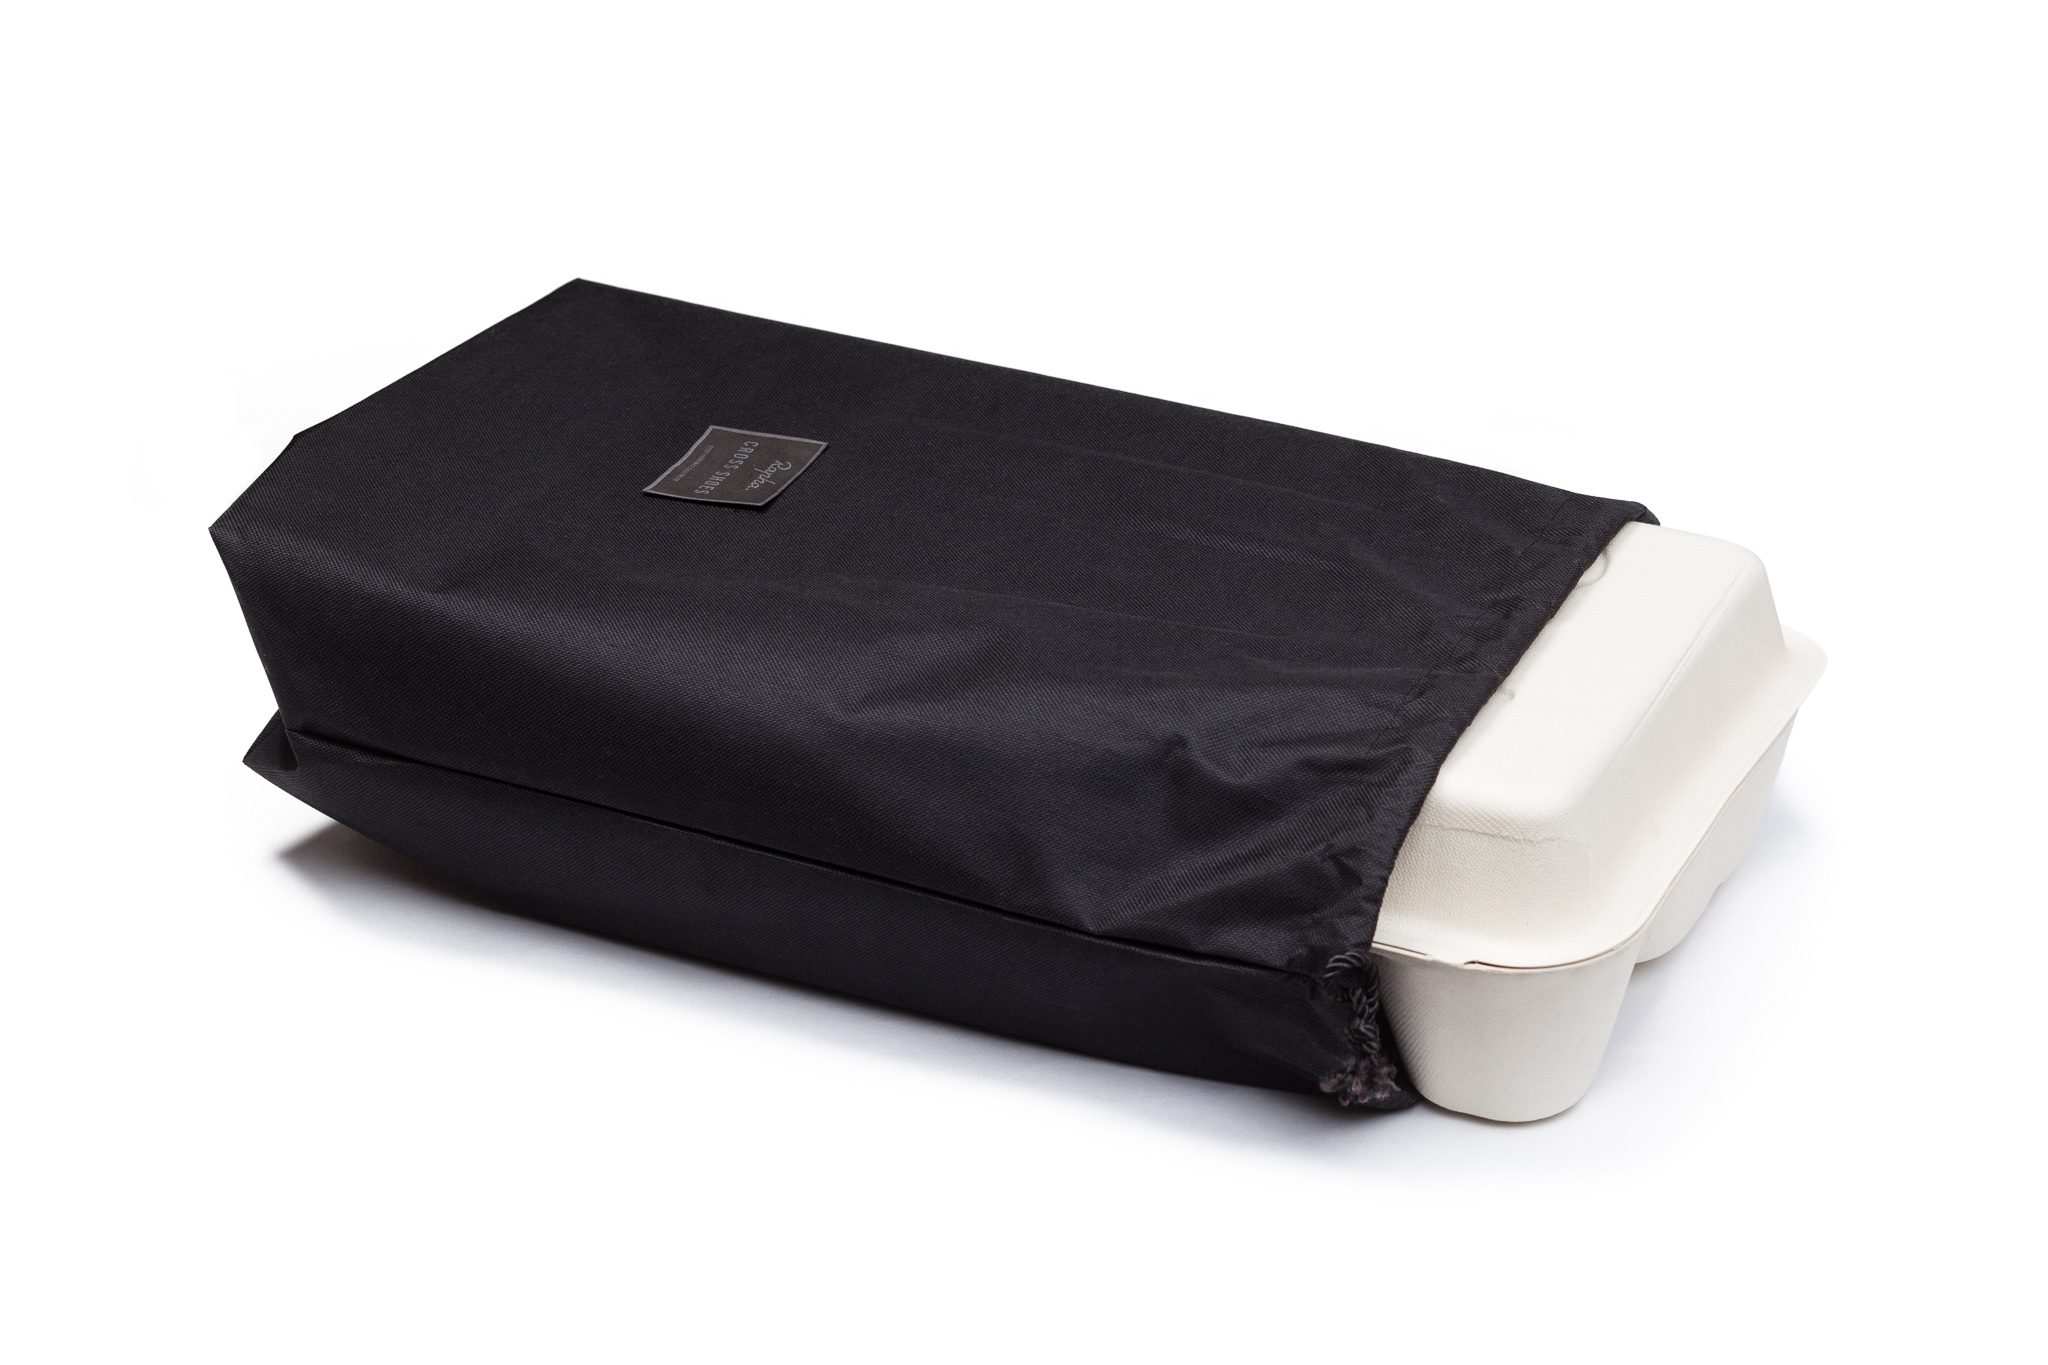 AW14-Rapha-Cross-Shoe-Packaging-5